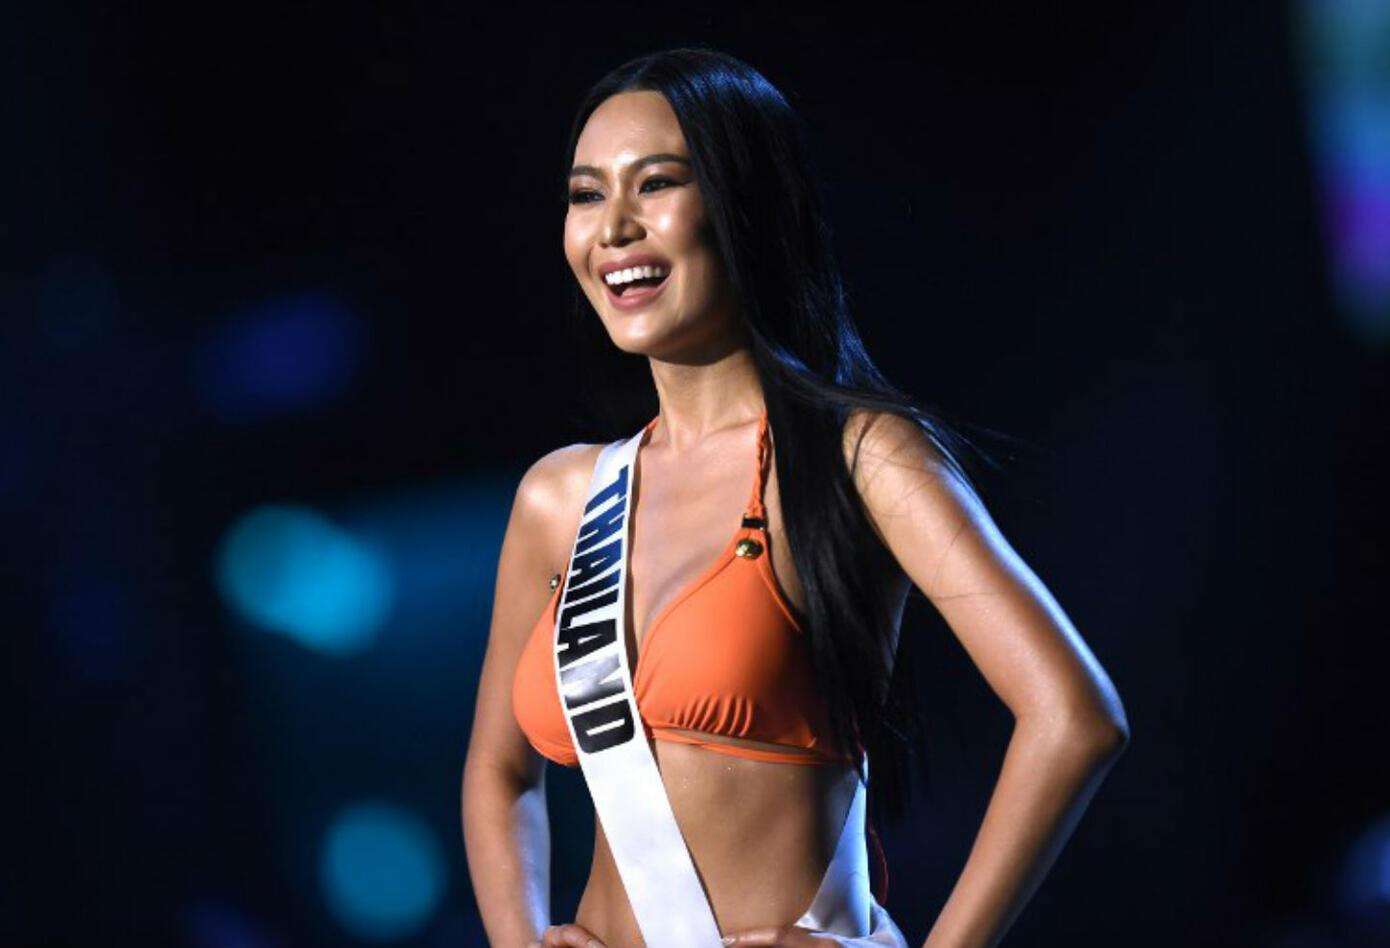 Miss Tailandia, Sophida Kanchanarin